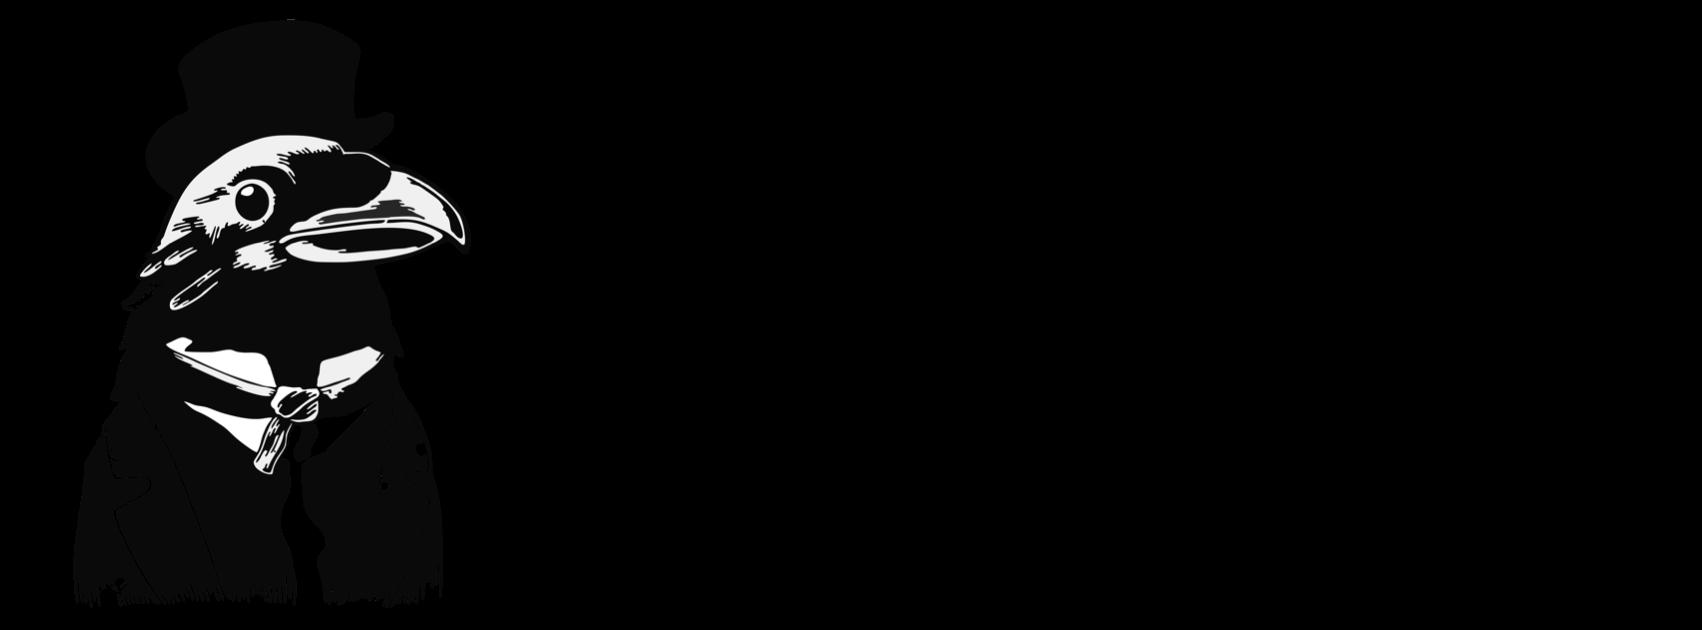 333EC9CE-4528-46C8-A6A4-0A615EF7CCB8